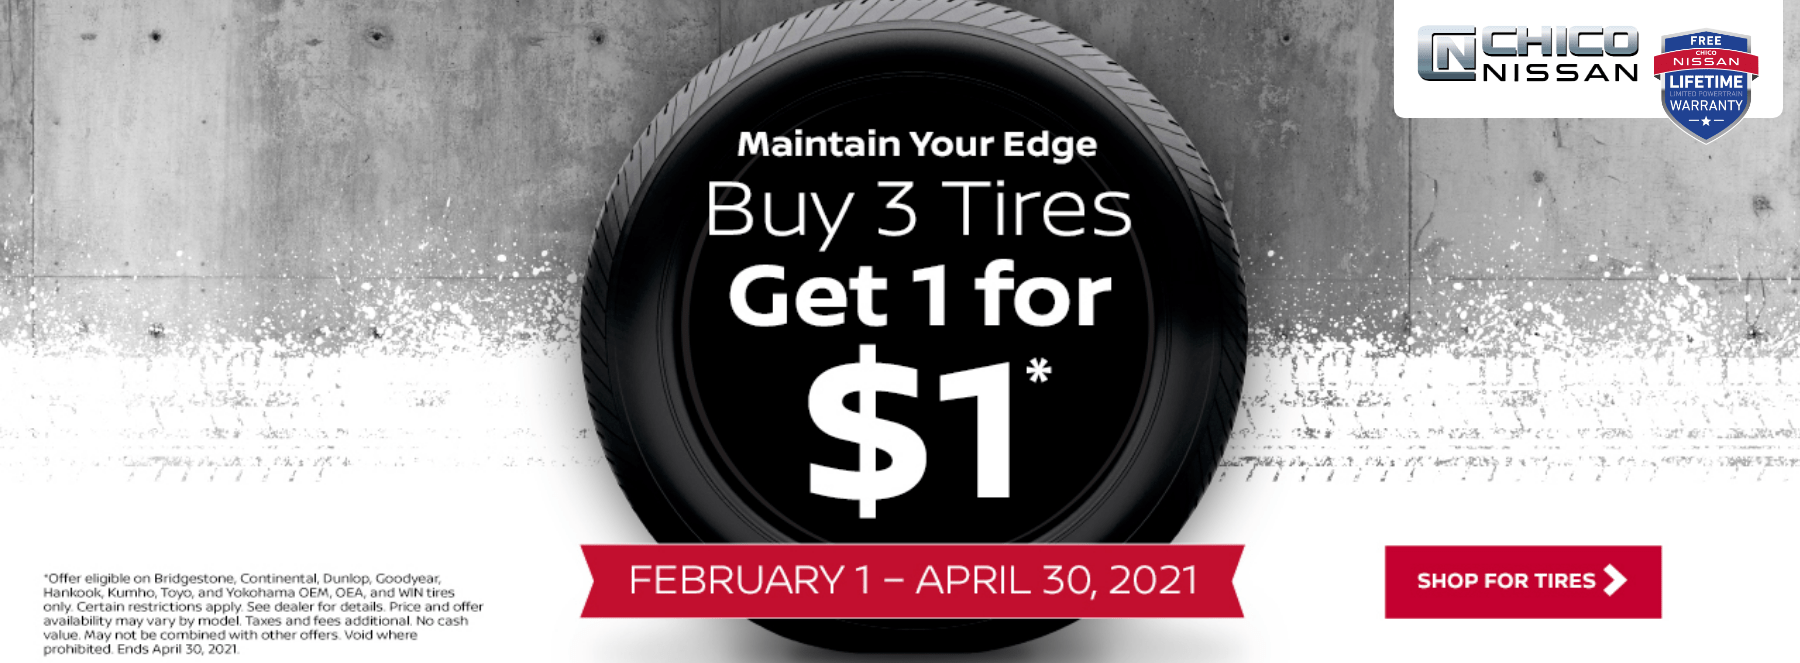 DSK Tire Sale – Buy 3 Get 1 Free Feb-April-1800x663px-Customsize1